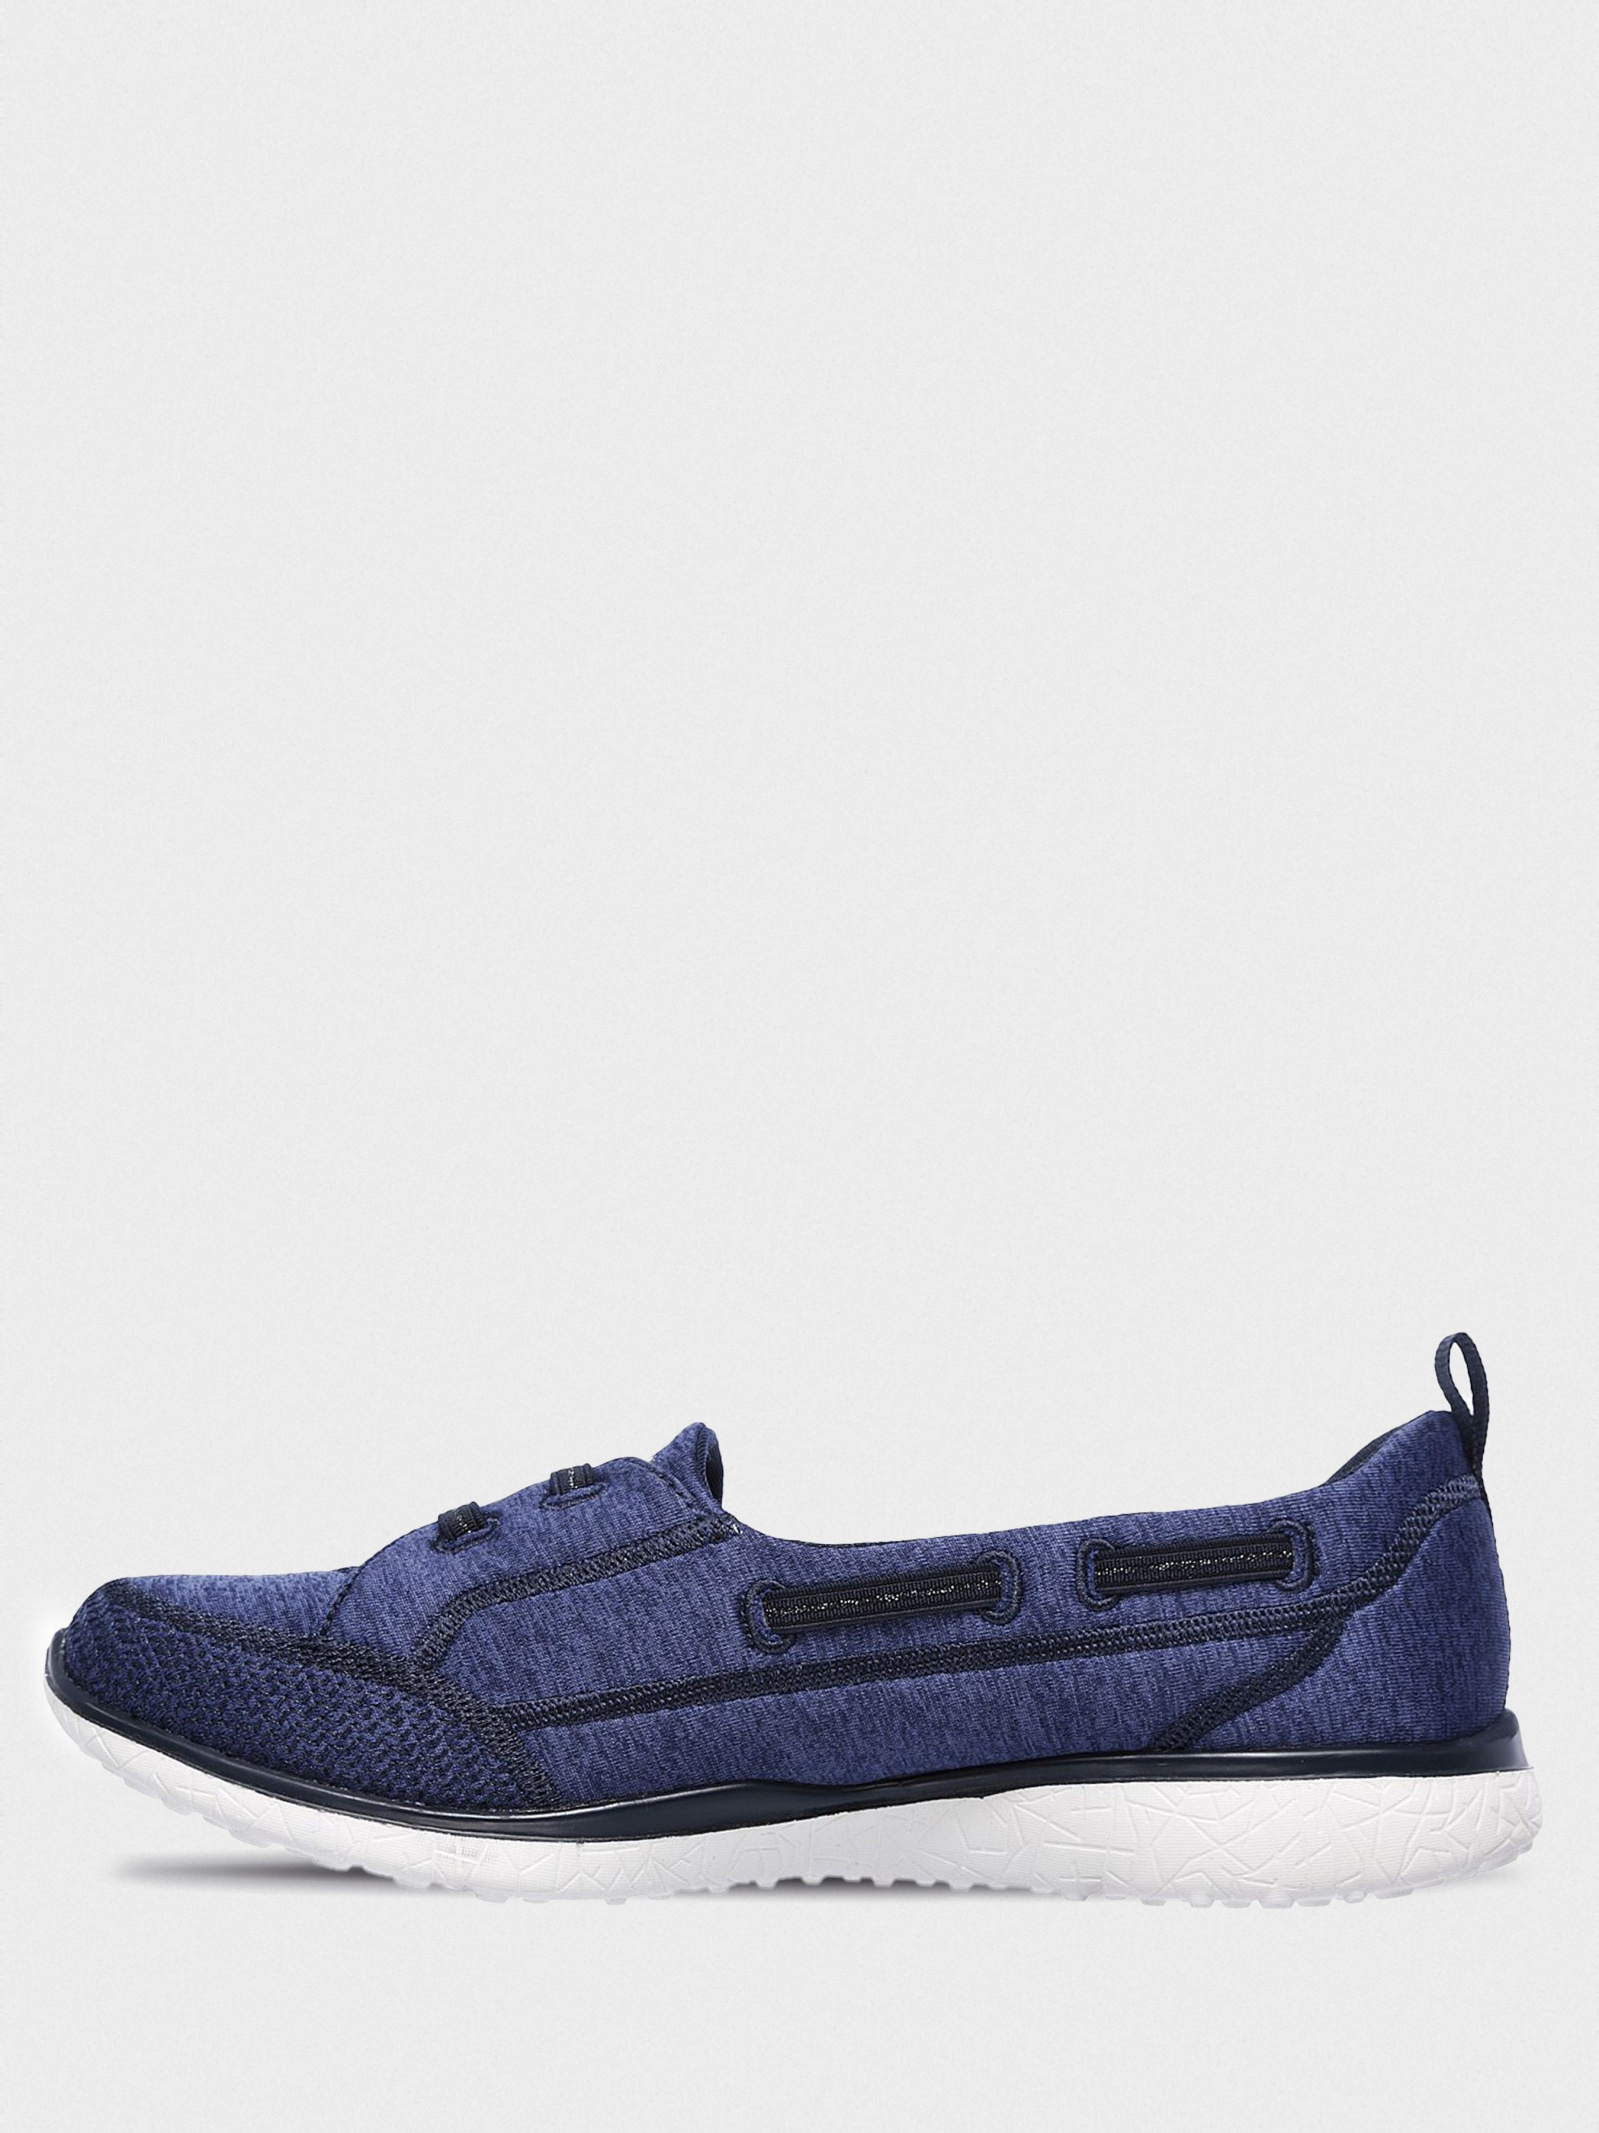 Сліпони  для жінок Skechers 23317 NVY модне взуття, 2017